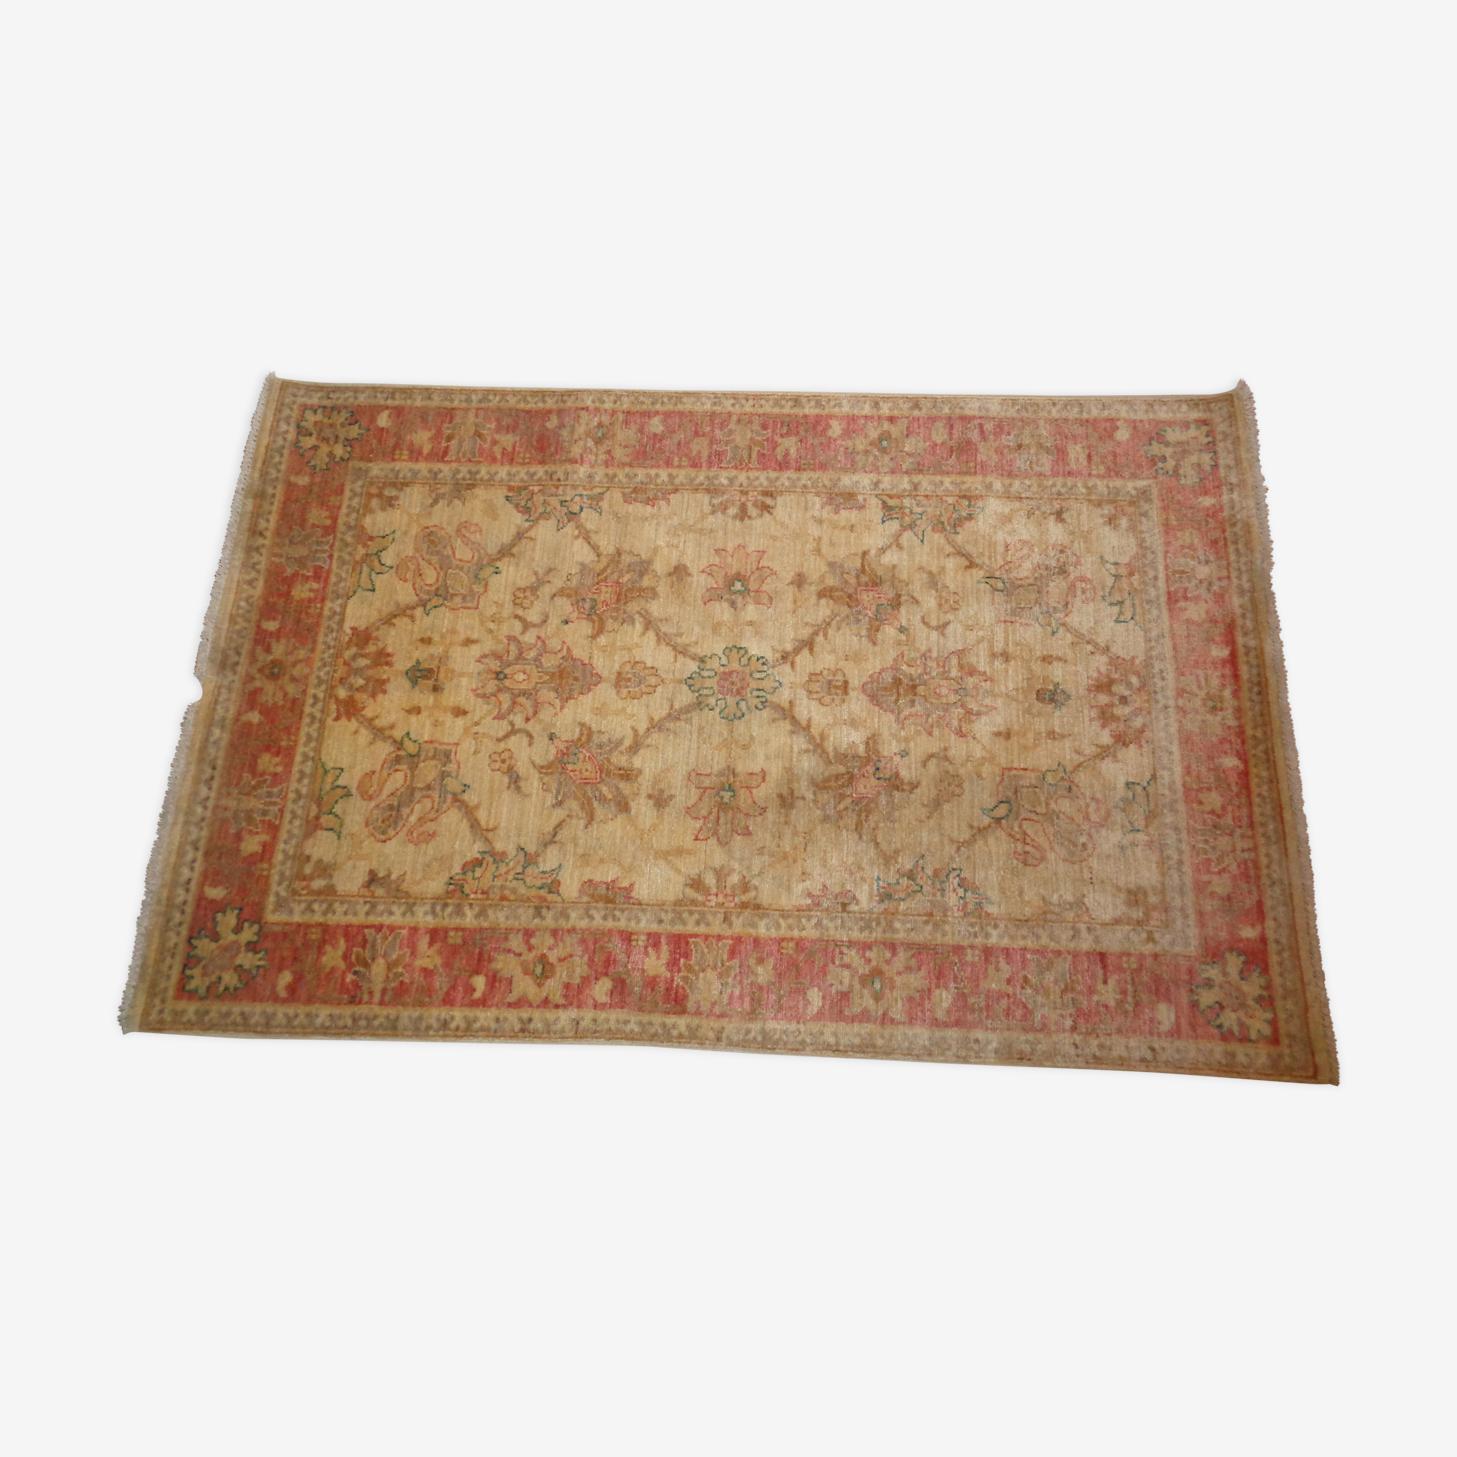 Tapis persan 100x160cm